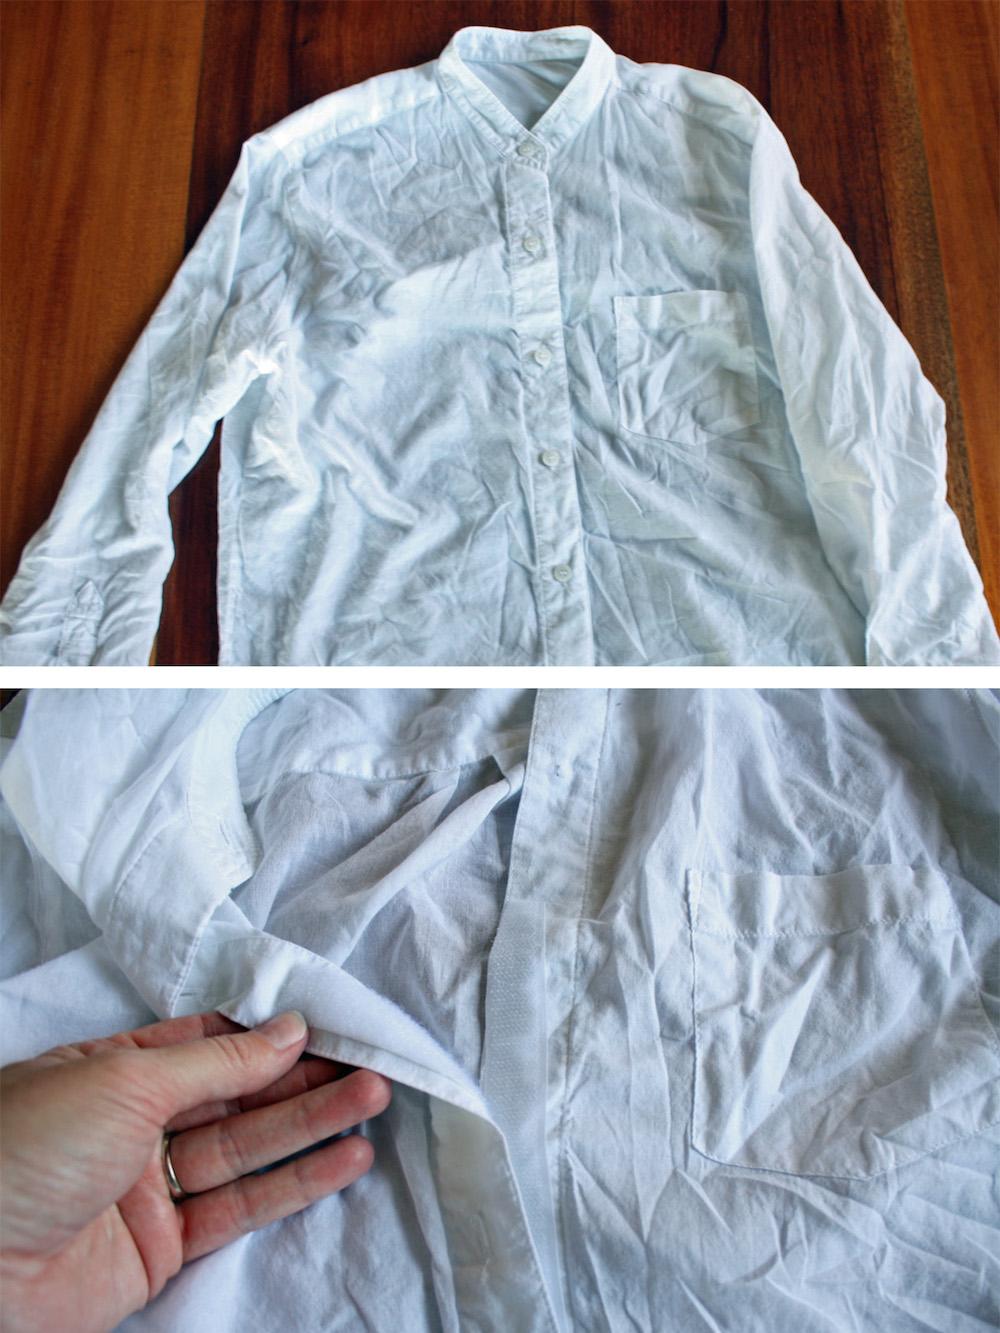 How to make a BFG shirt